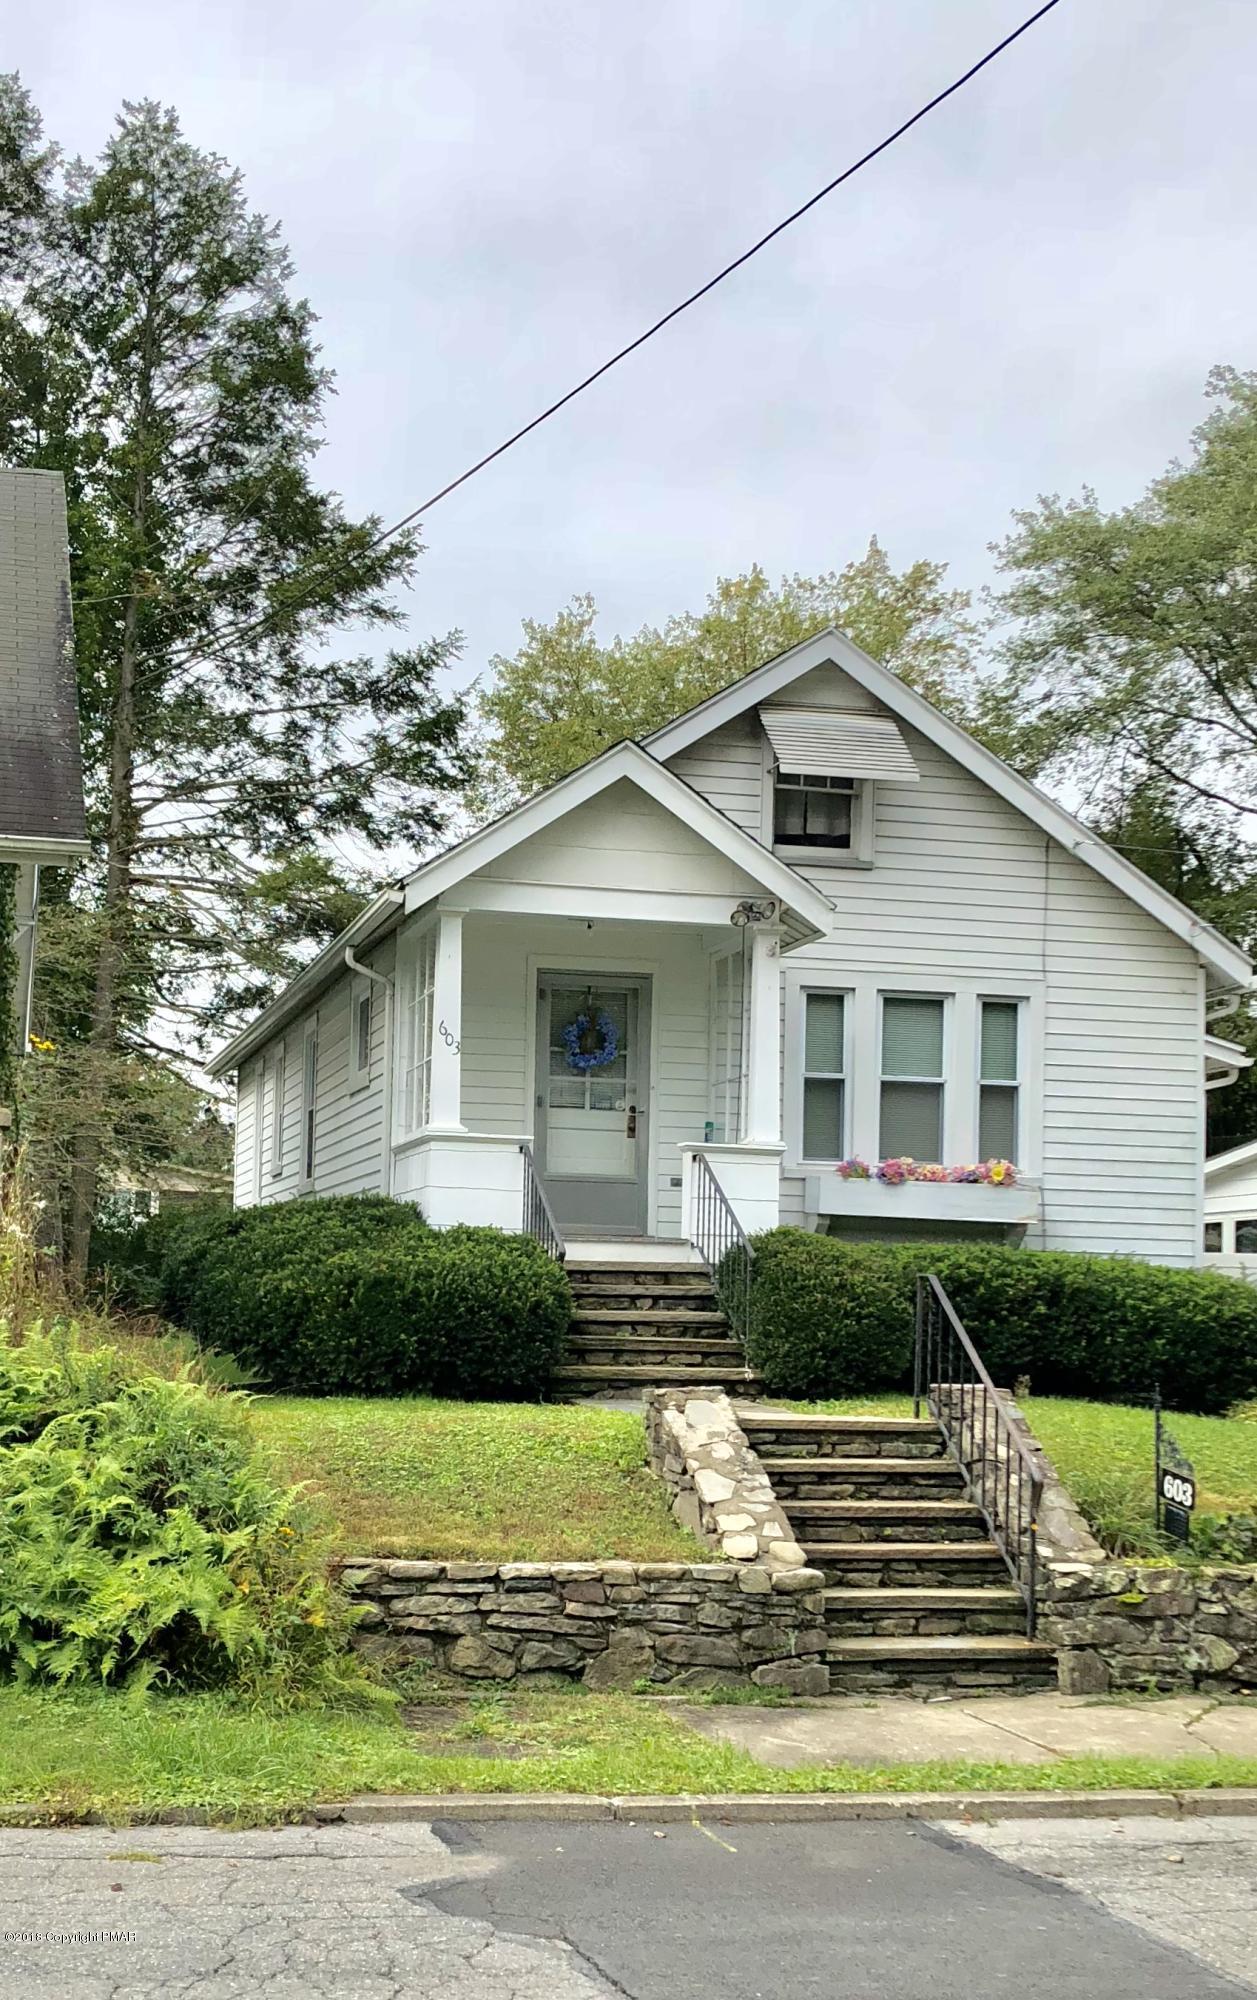 603 Queen St, Stroudsburg, PA 18360